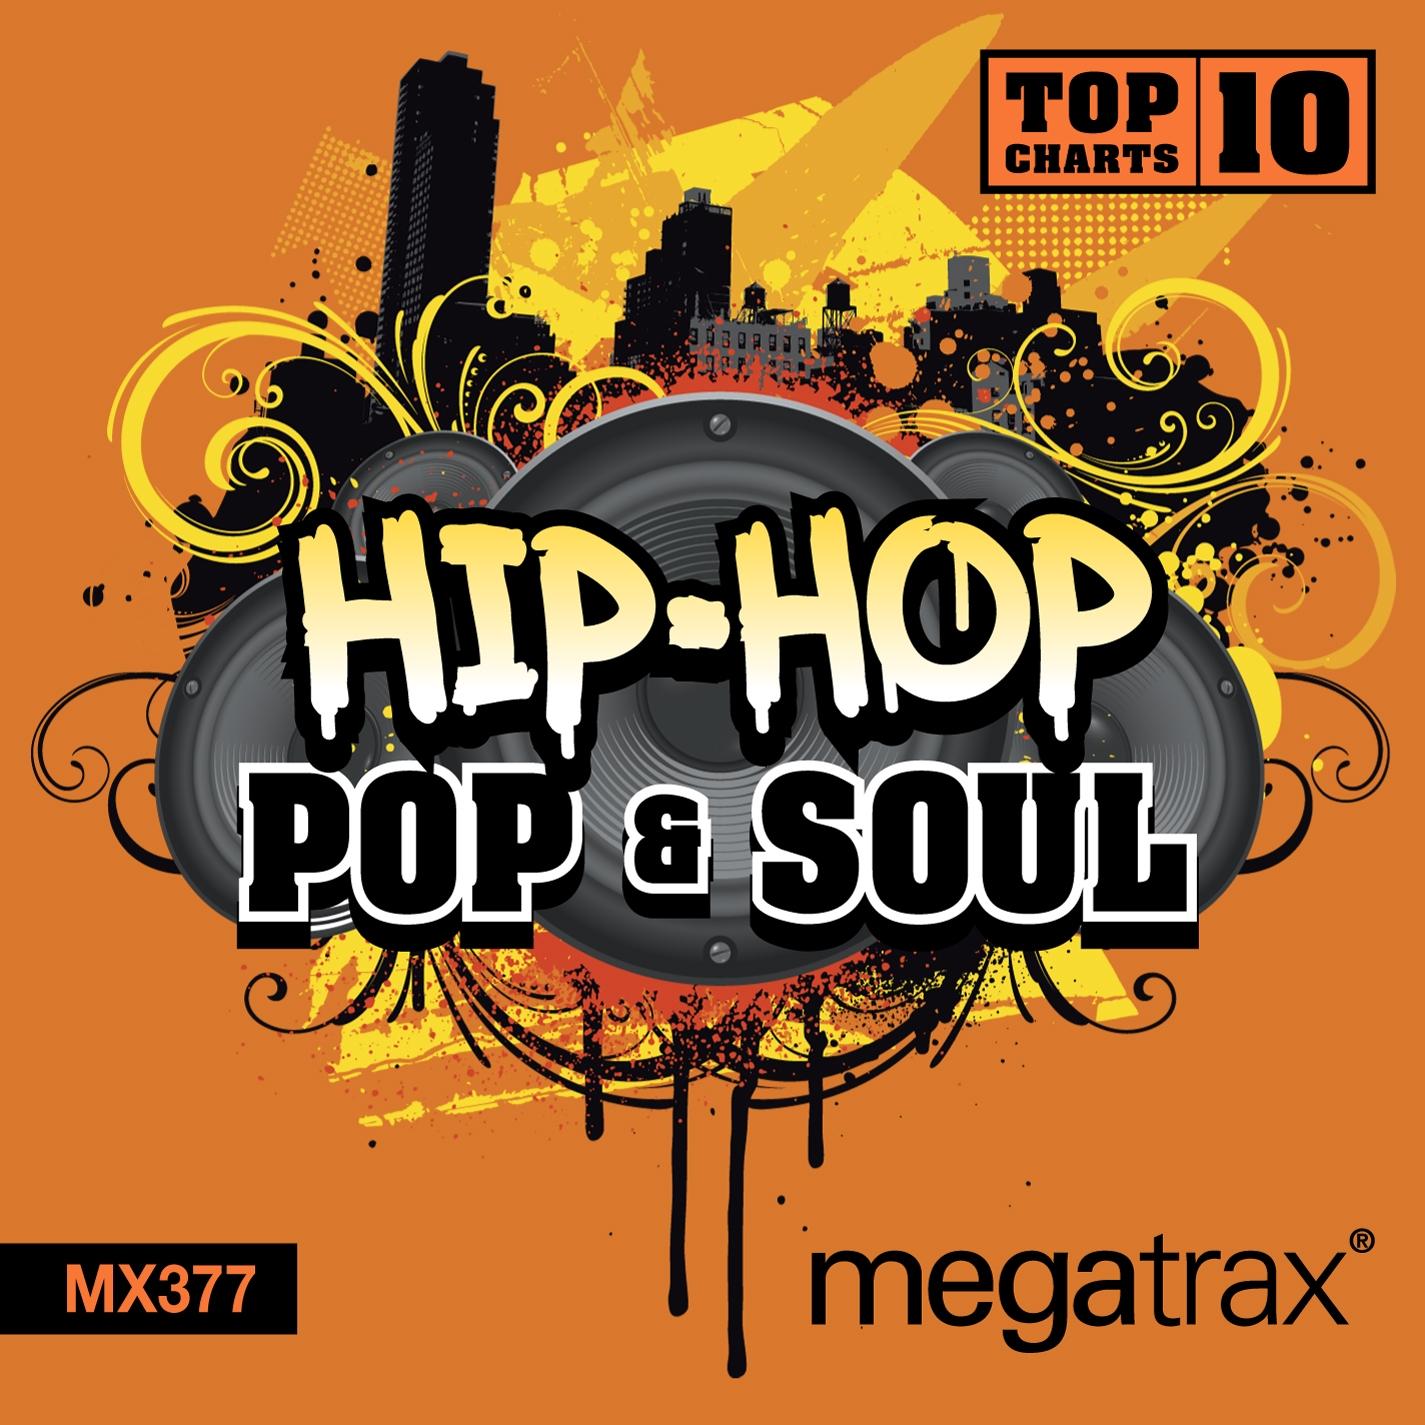 Top Charts 10: Hip-Hop, Pop And Soul